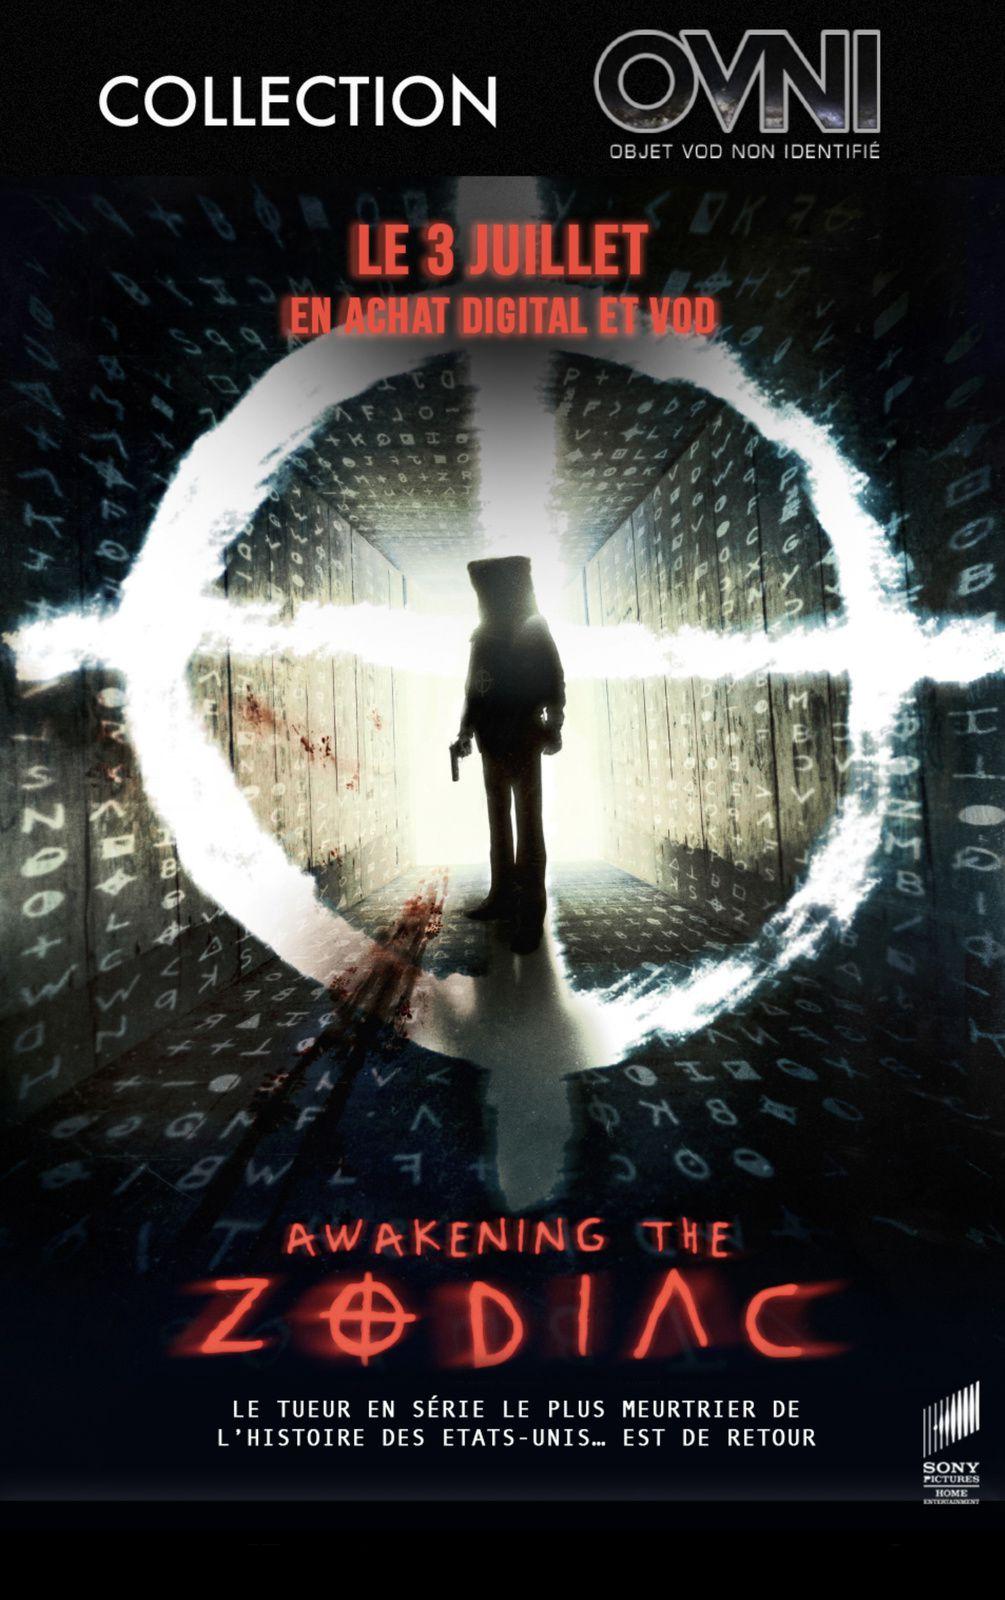 OVNI : AWAKENING THE ZODIAC en VOD et Achat Digital le 3 juillet 2017